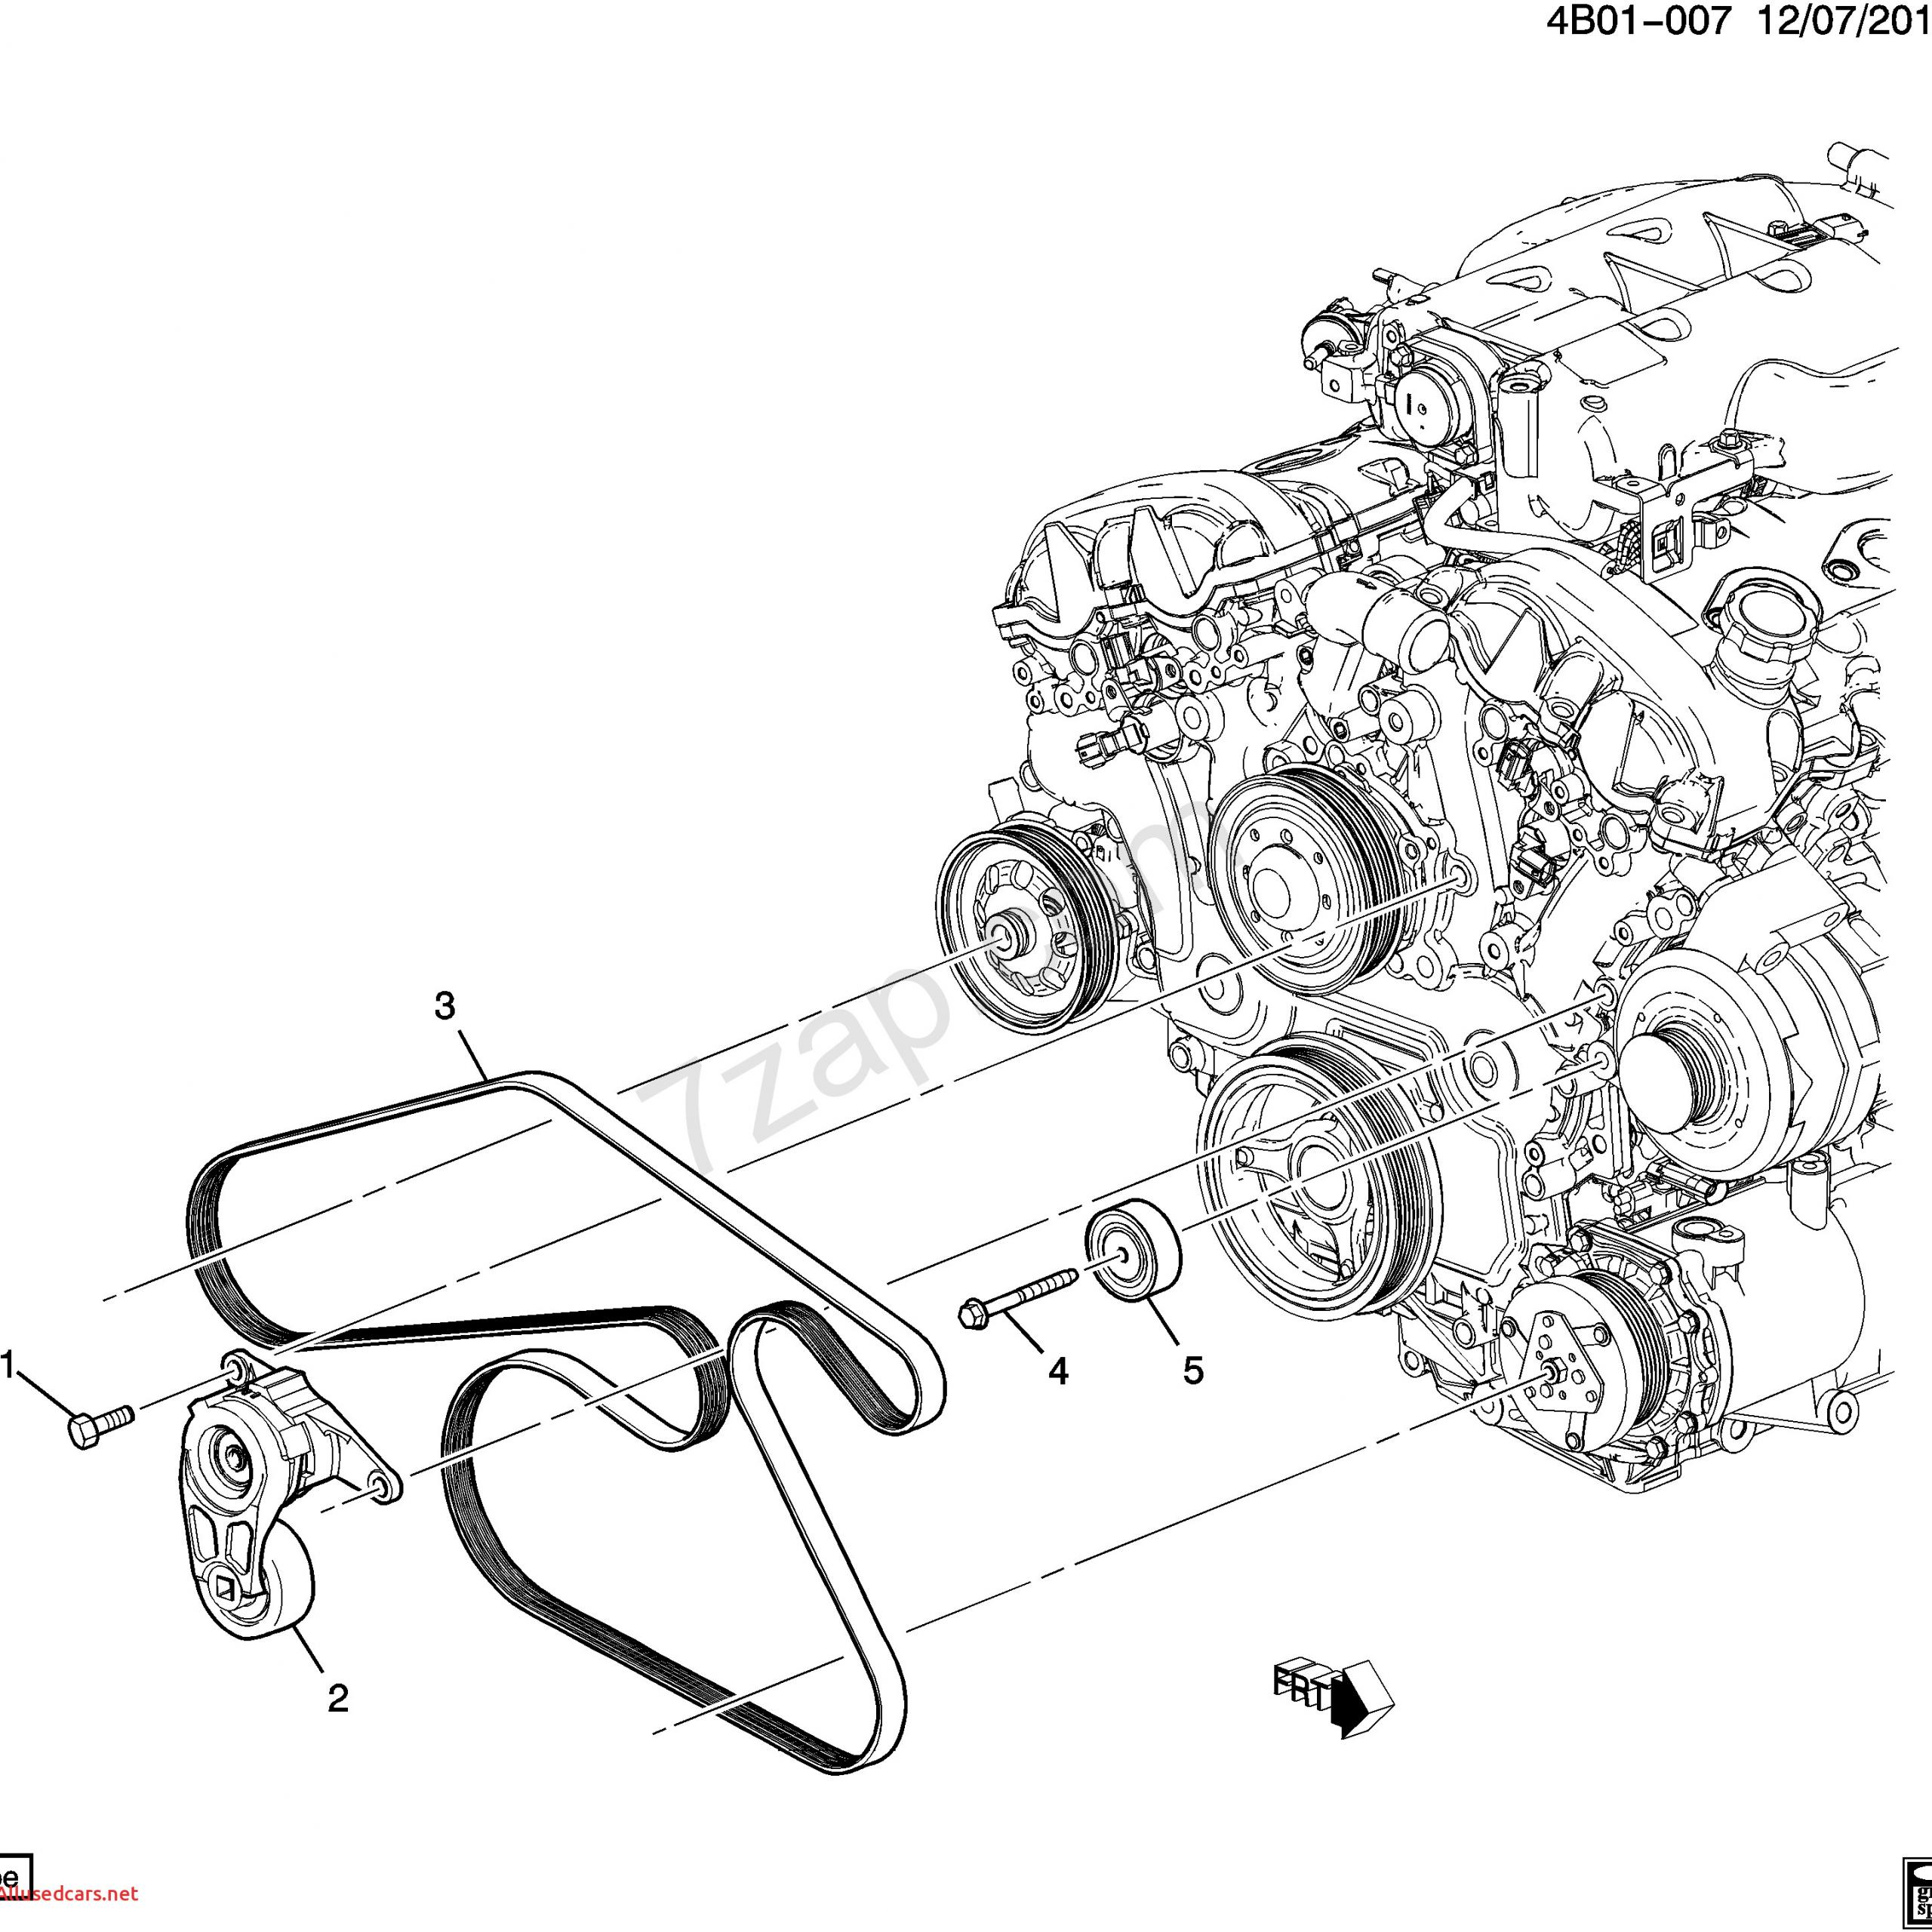 Chevy Captiva Sport New 2012 2015 Lr Pulleys Belts Accessory Drive Lfw 3 0 5 Captiva Sport Belt Accessories Chevy